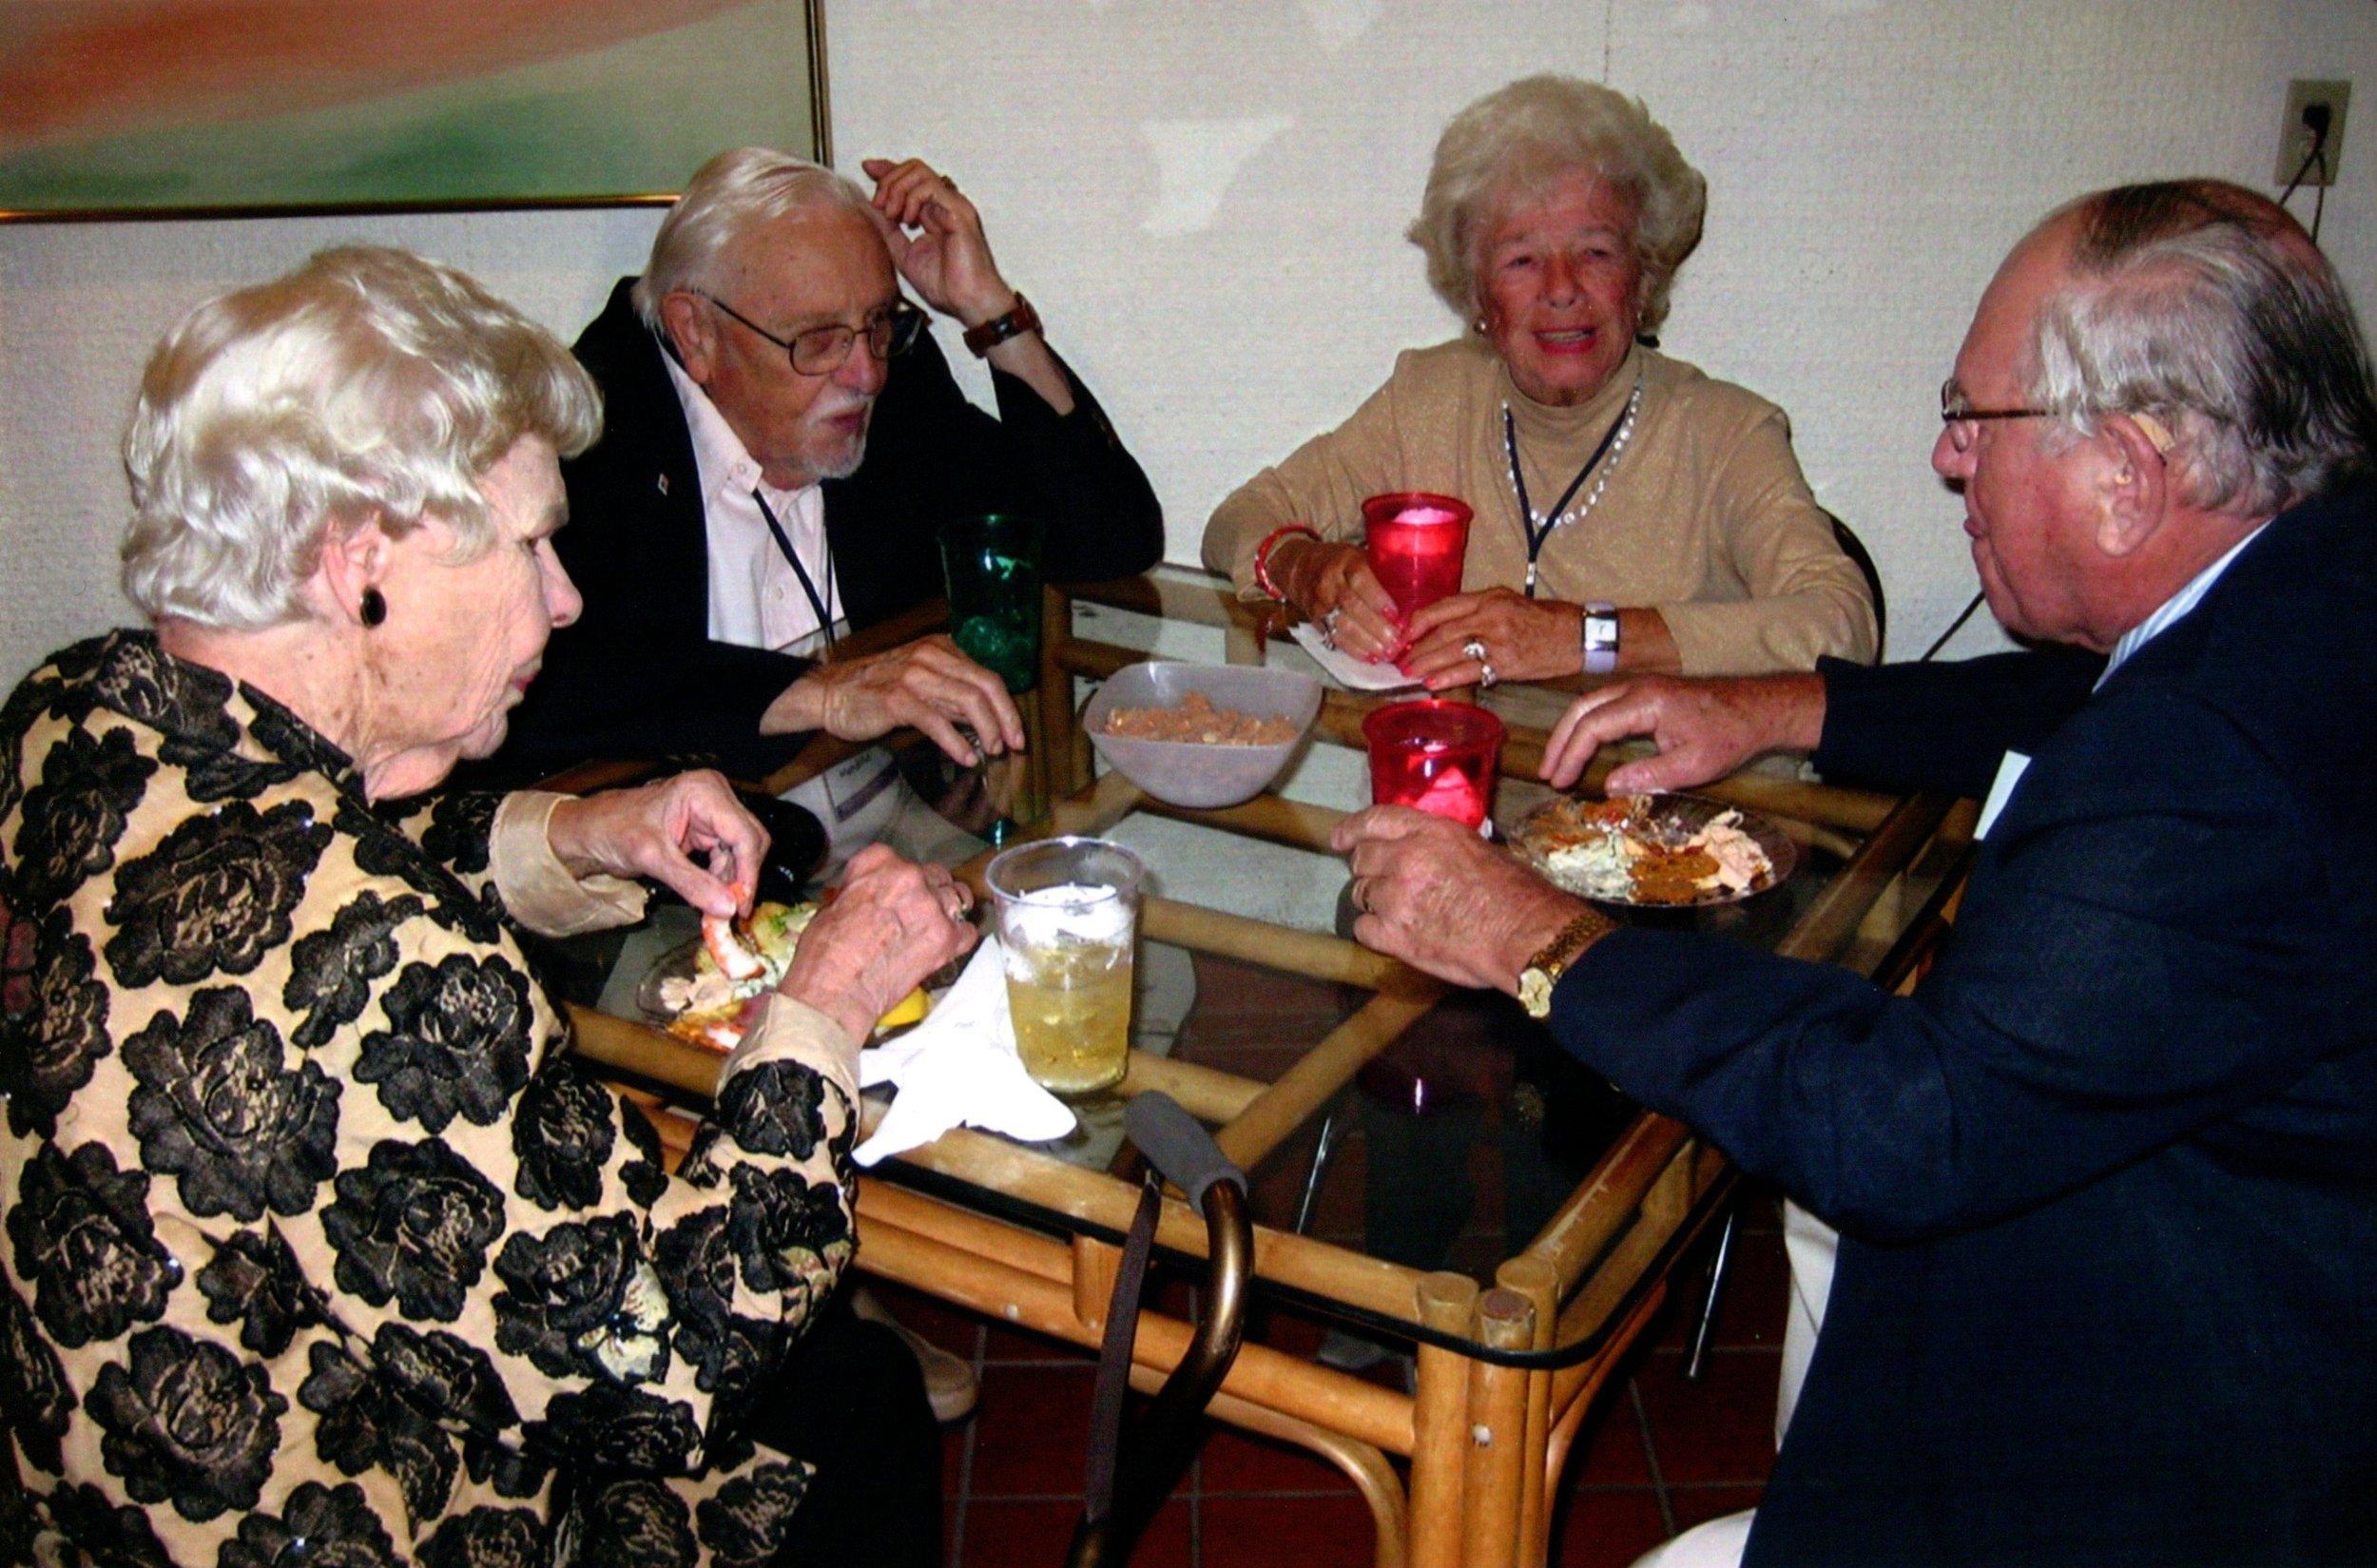 12_11_2008 - HOLIDAY PARTY - TOM WHEELER'S HOME 6.jpg